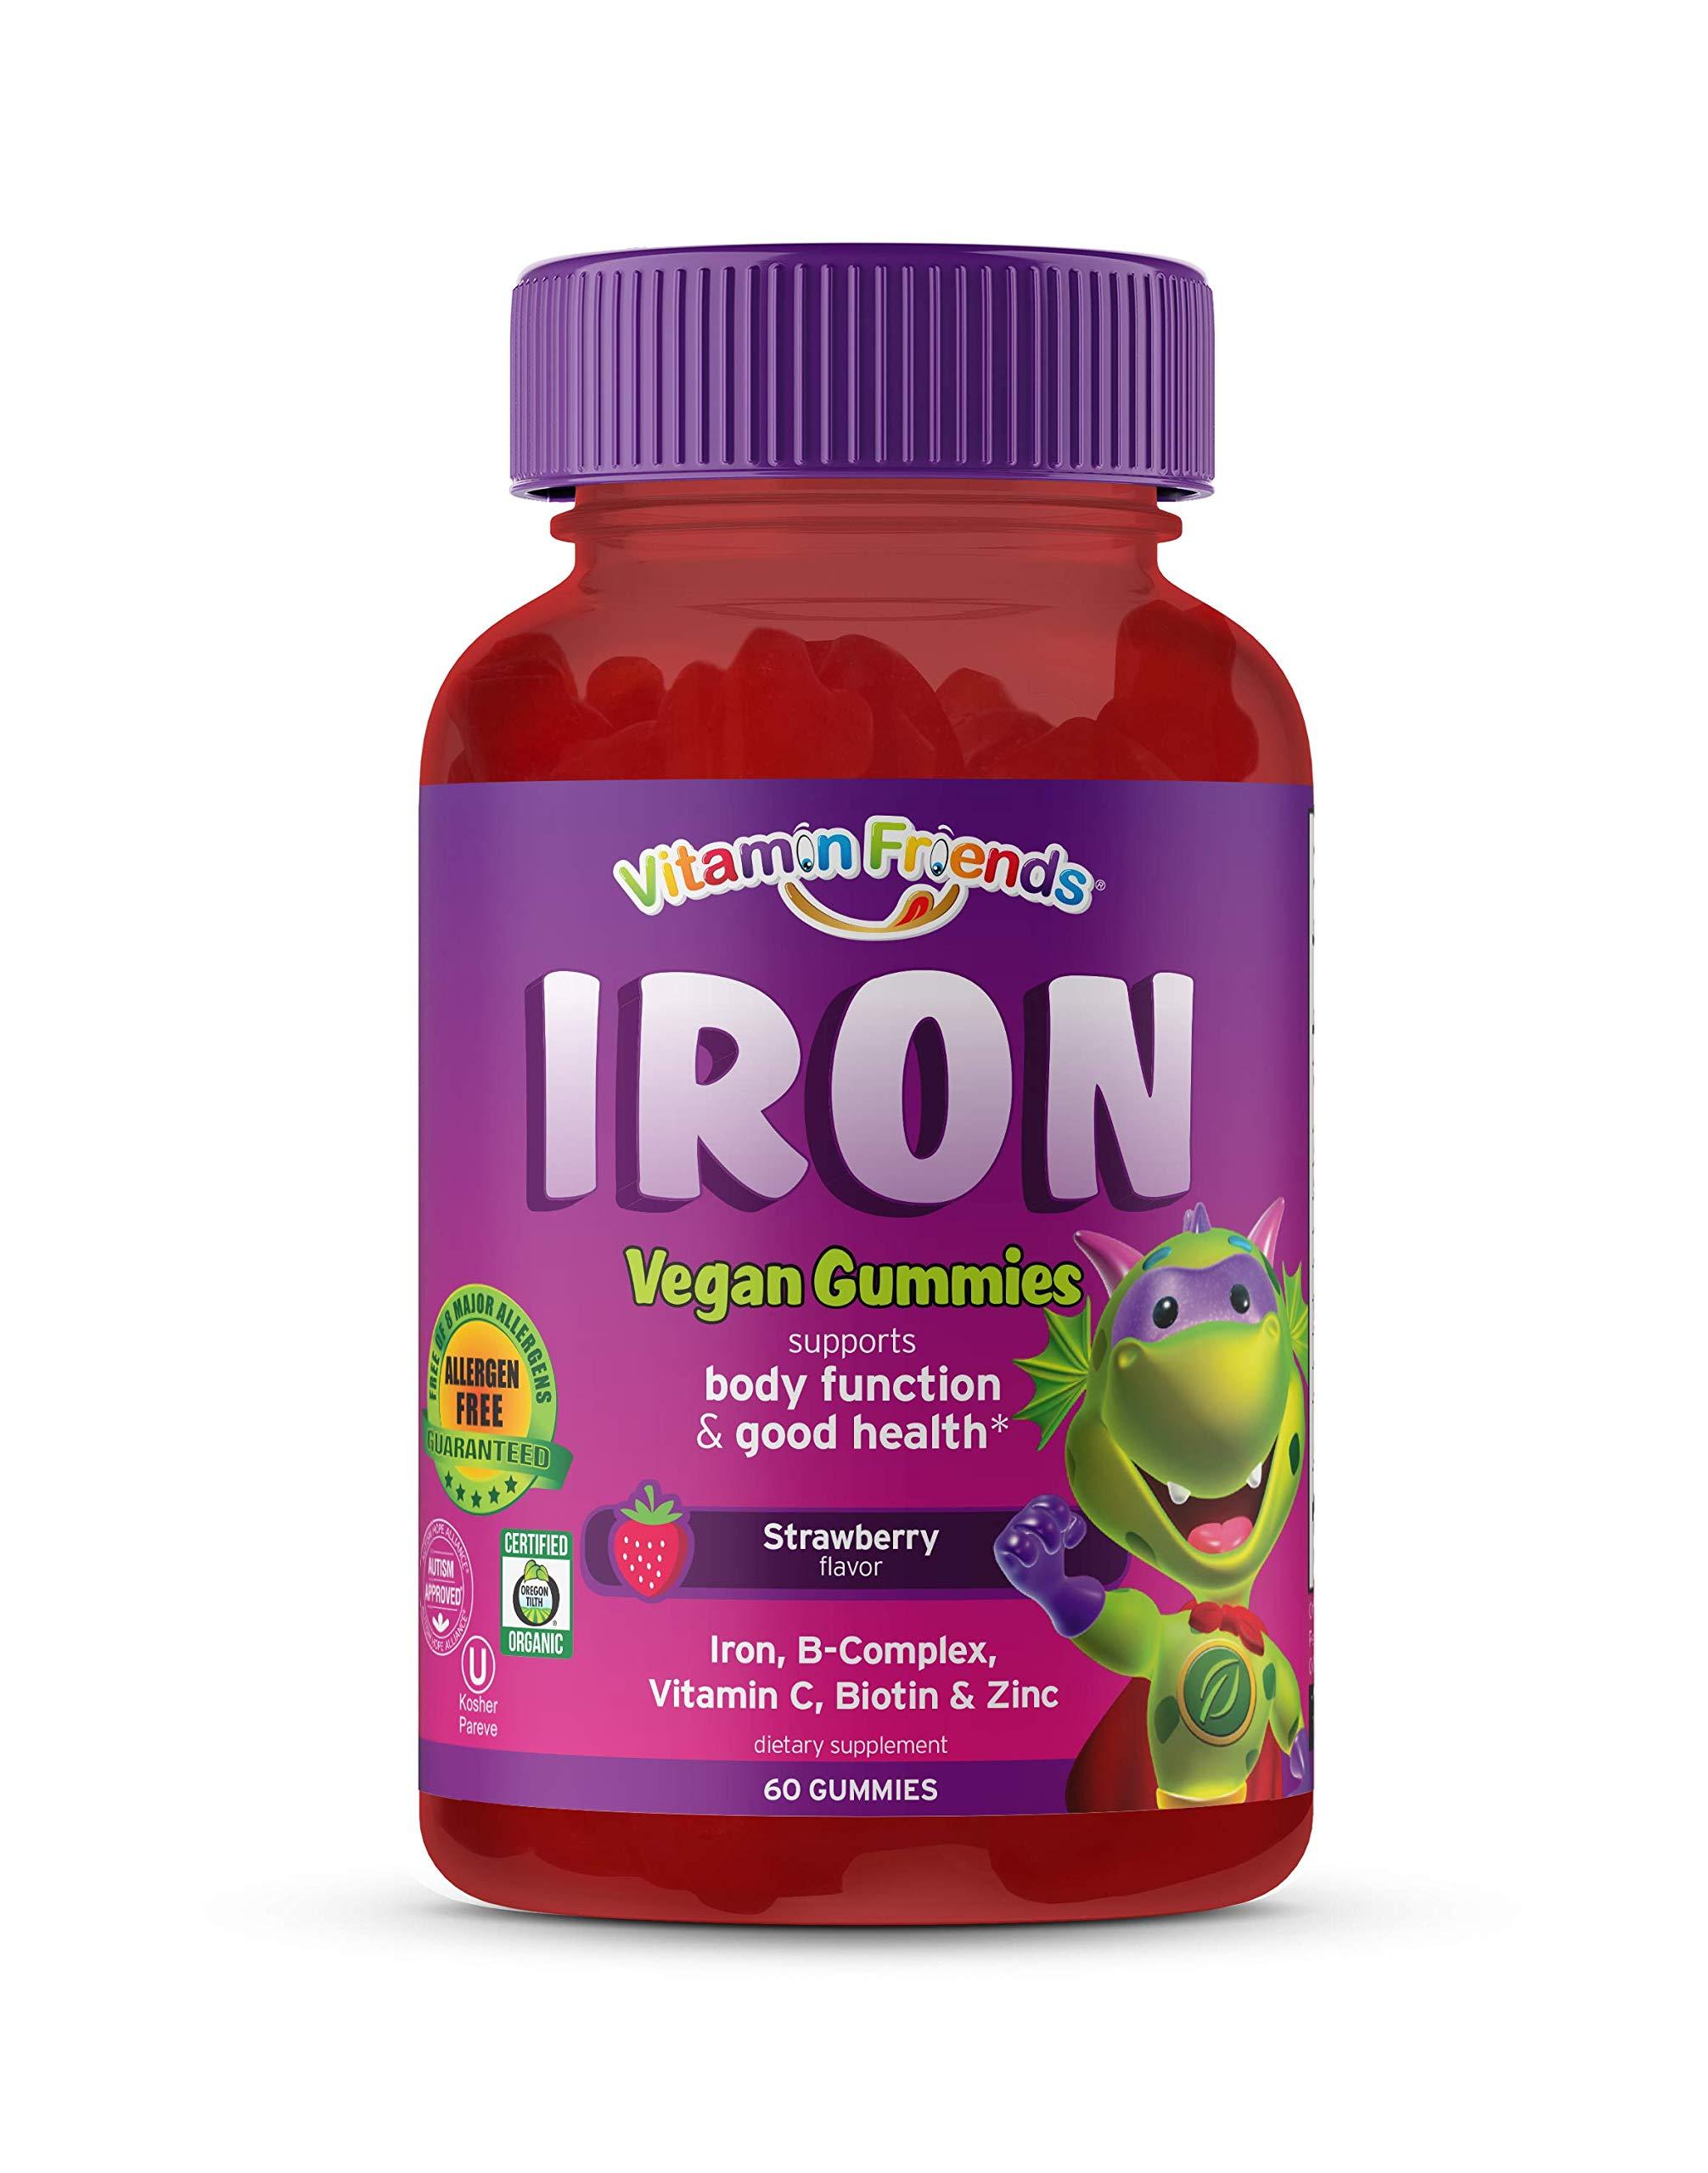 Vitamin Friends Iron Multivitamin for Kids – Vegan (60 Day Supply) Ferrous Fumarate with B-Complex, Vitamin C, Zinc…